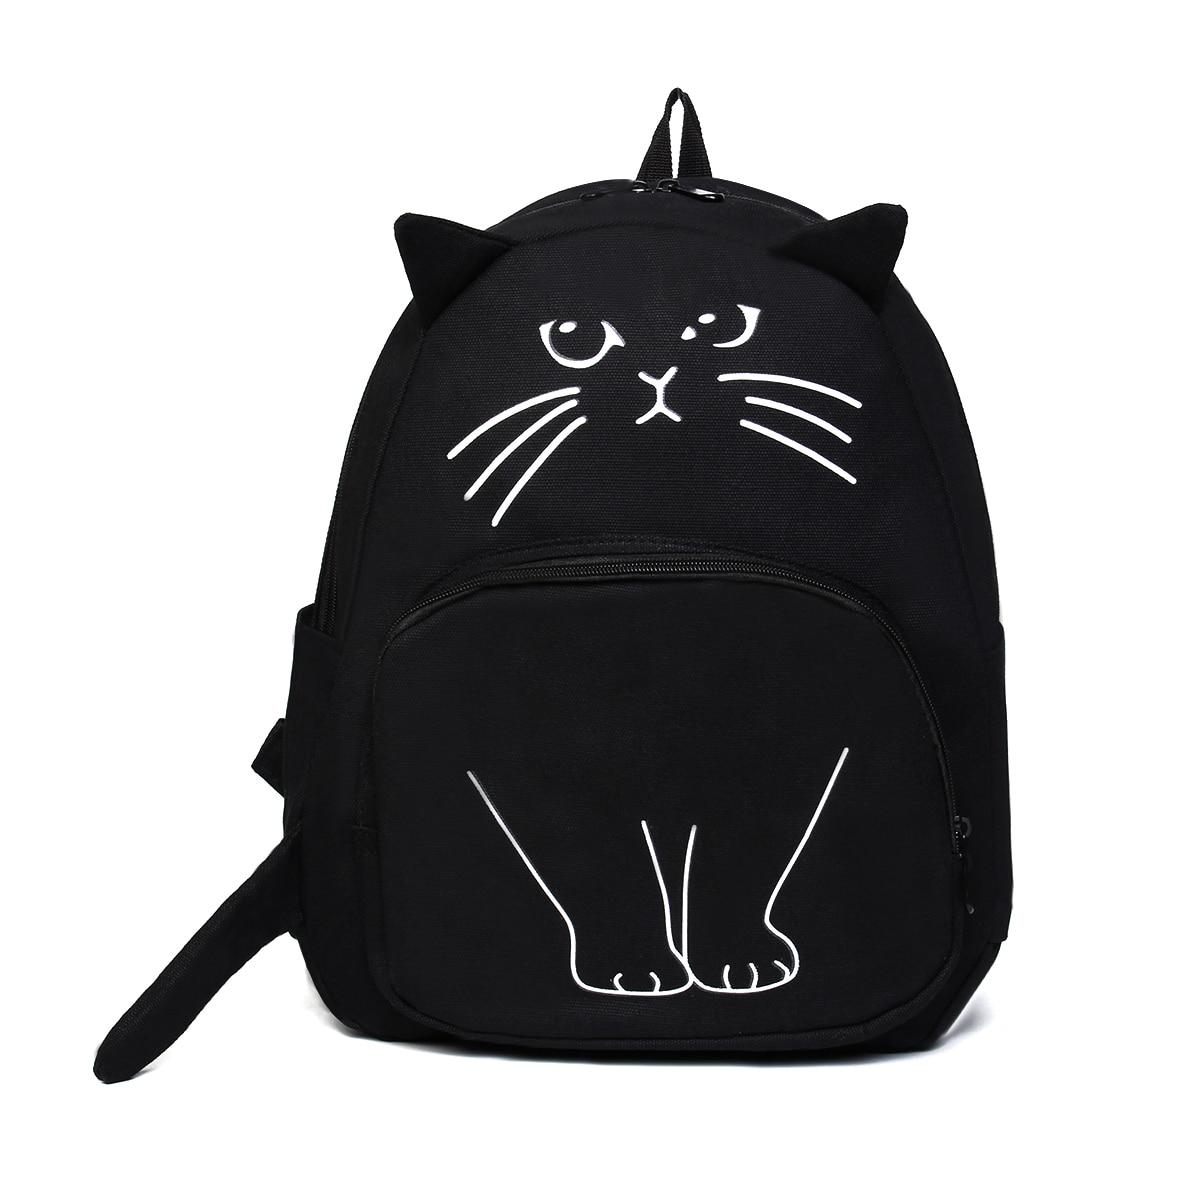 Osmond, Mochila de gato bonito, Mochila escolar de lona negra para adolescentes, Mochila con impresión 3D, Mochila de viaje, Mochila